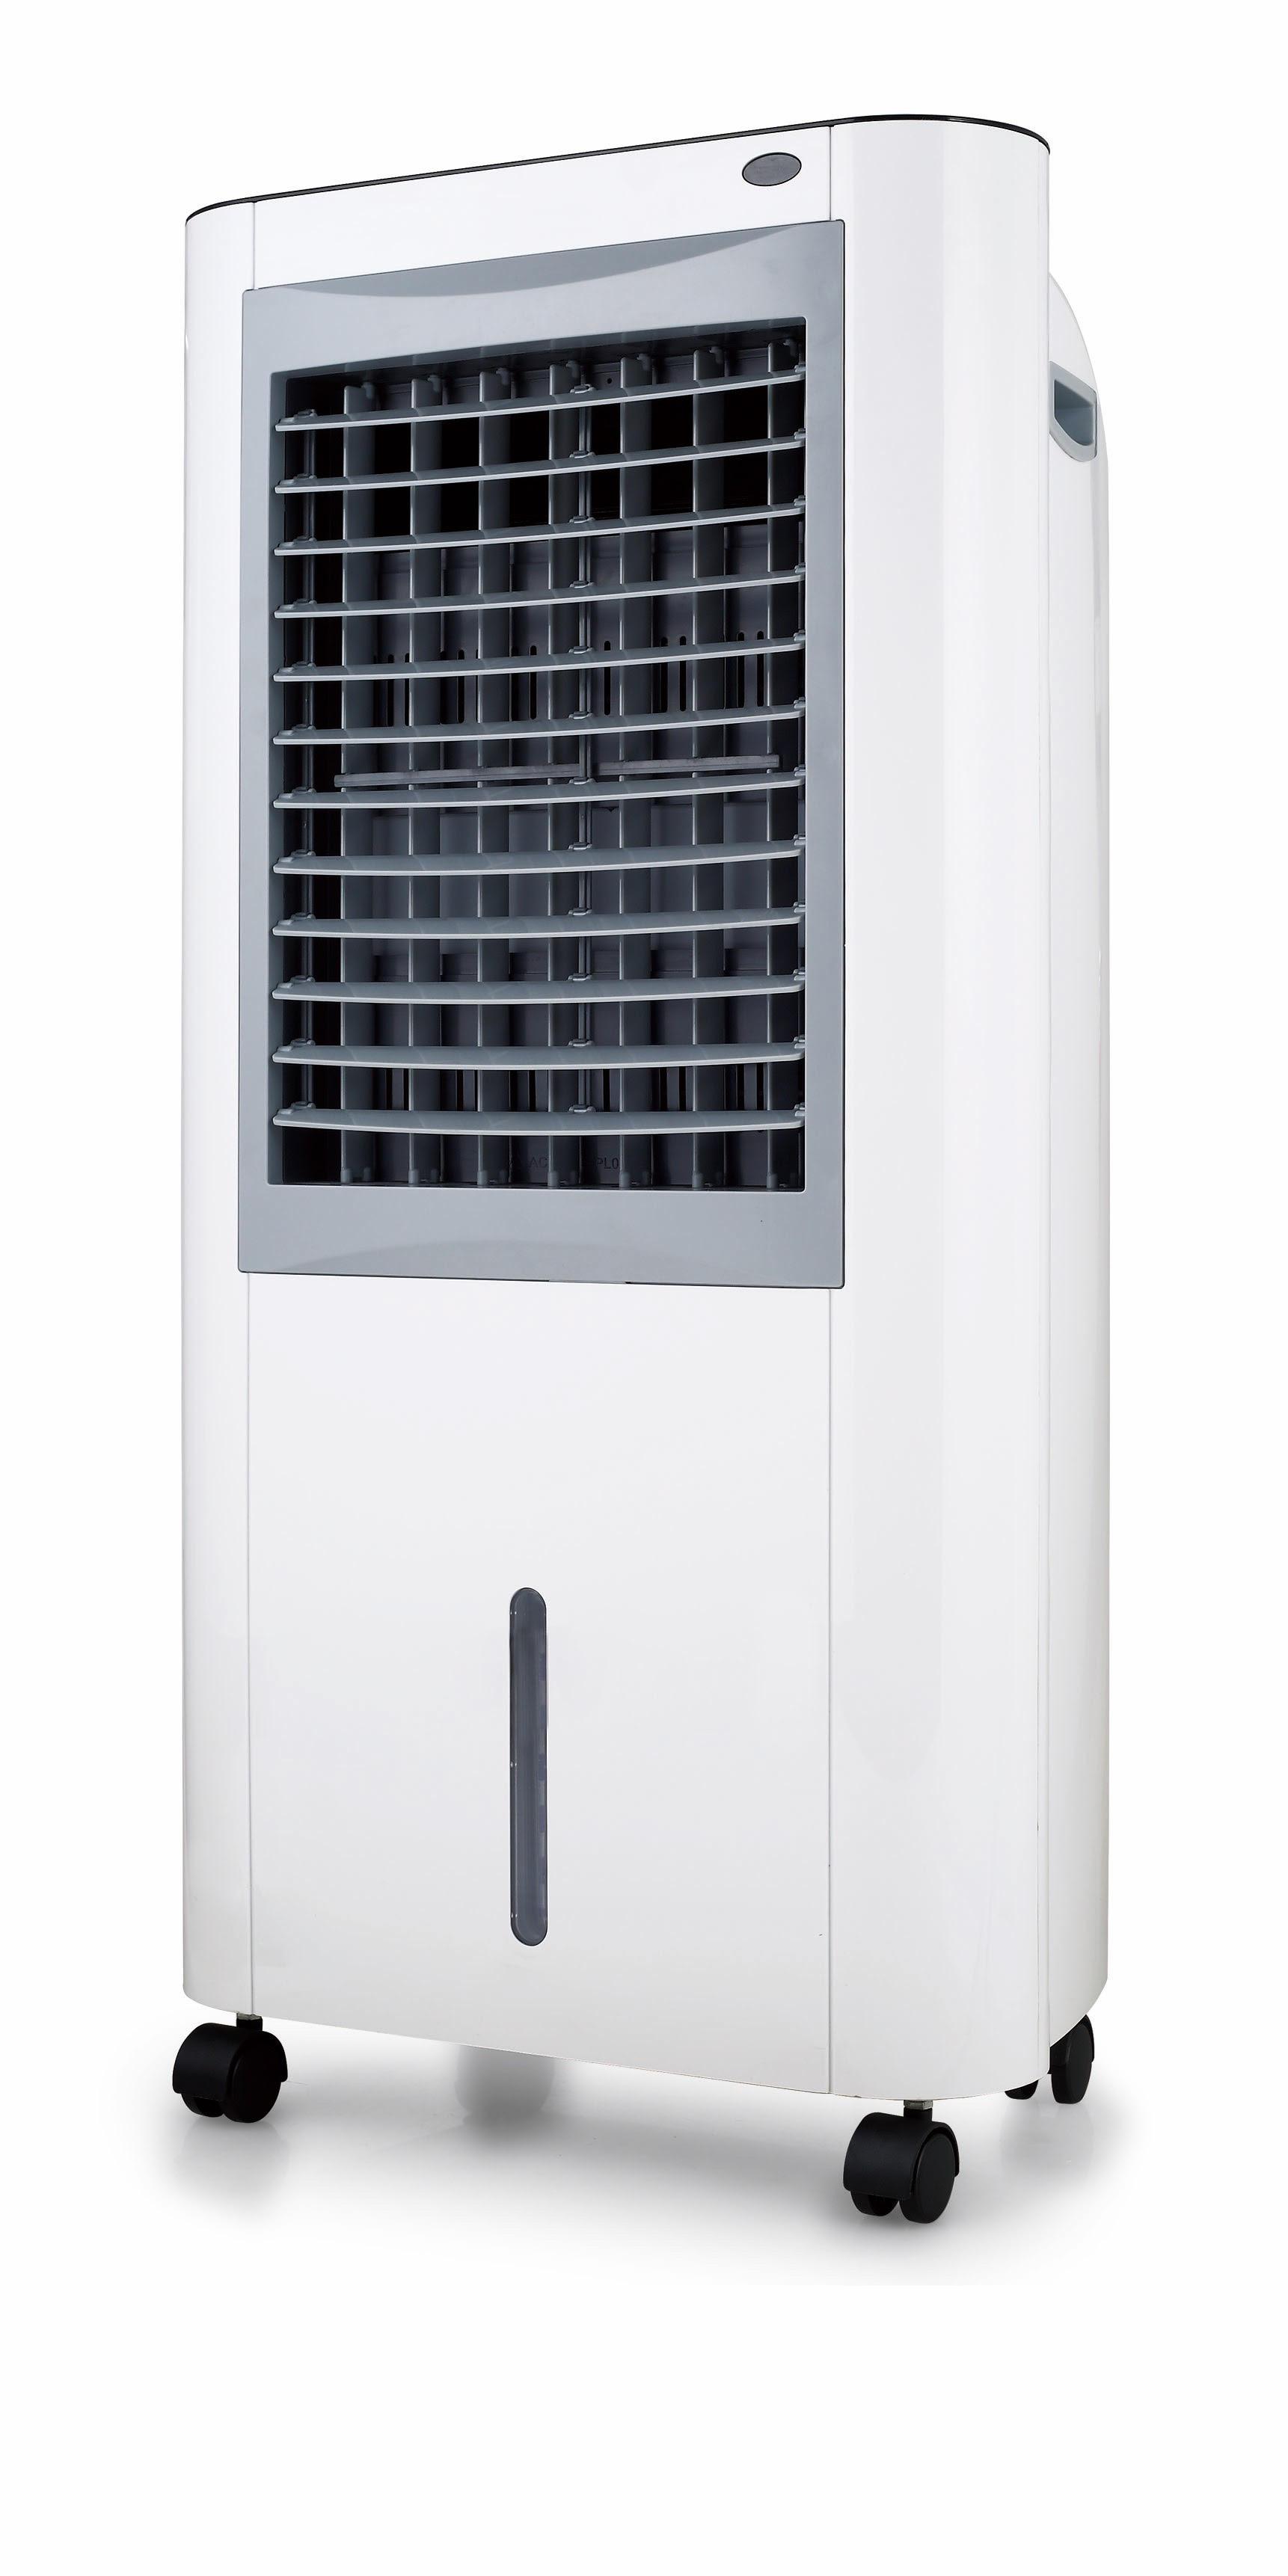 Climatizador evaporativo Yatek YK-M99, 10L de